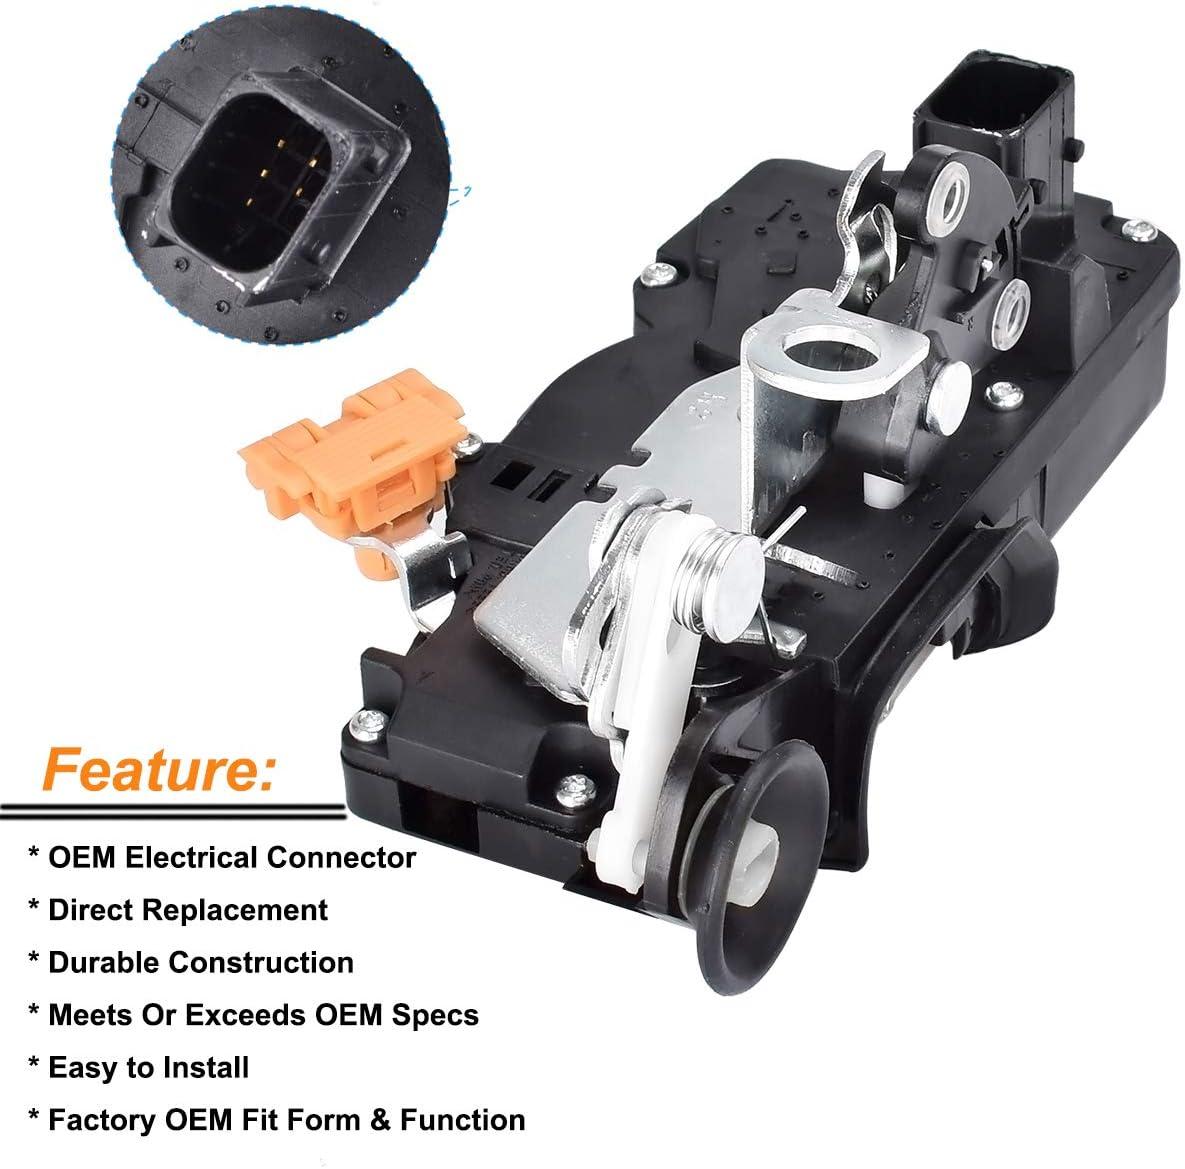 FAERSI Passenger Rear Door Latch /& Lock Actuator Motor for 2007 2008 2009 Cadillac Escalade Chevrolet Tahoe GMC Yukon 15785127 15896625 20783858 25873487 25876390